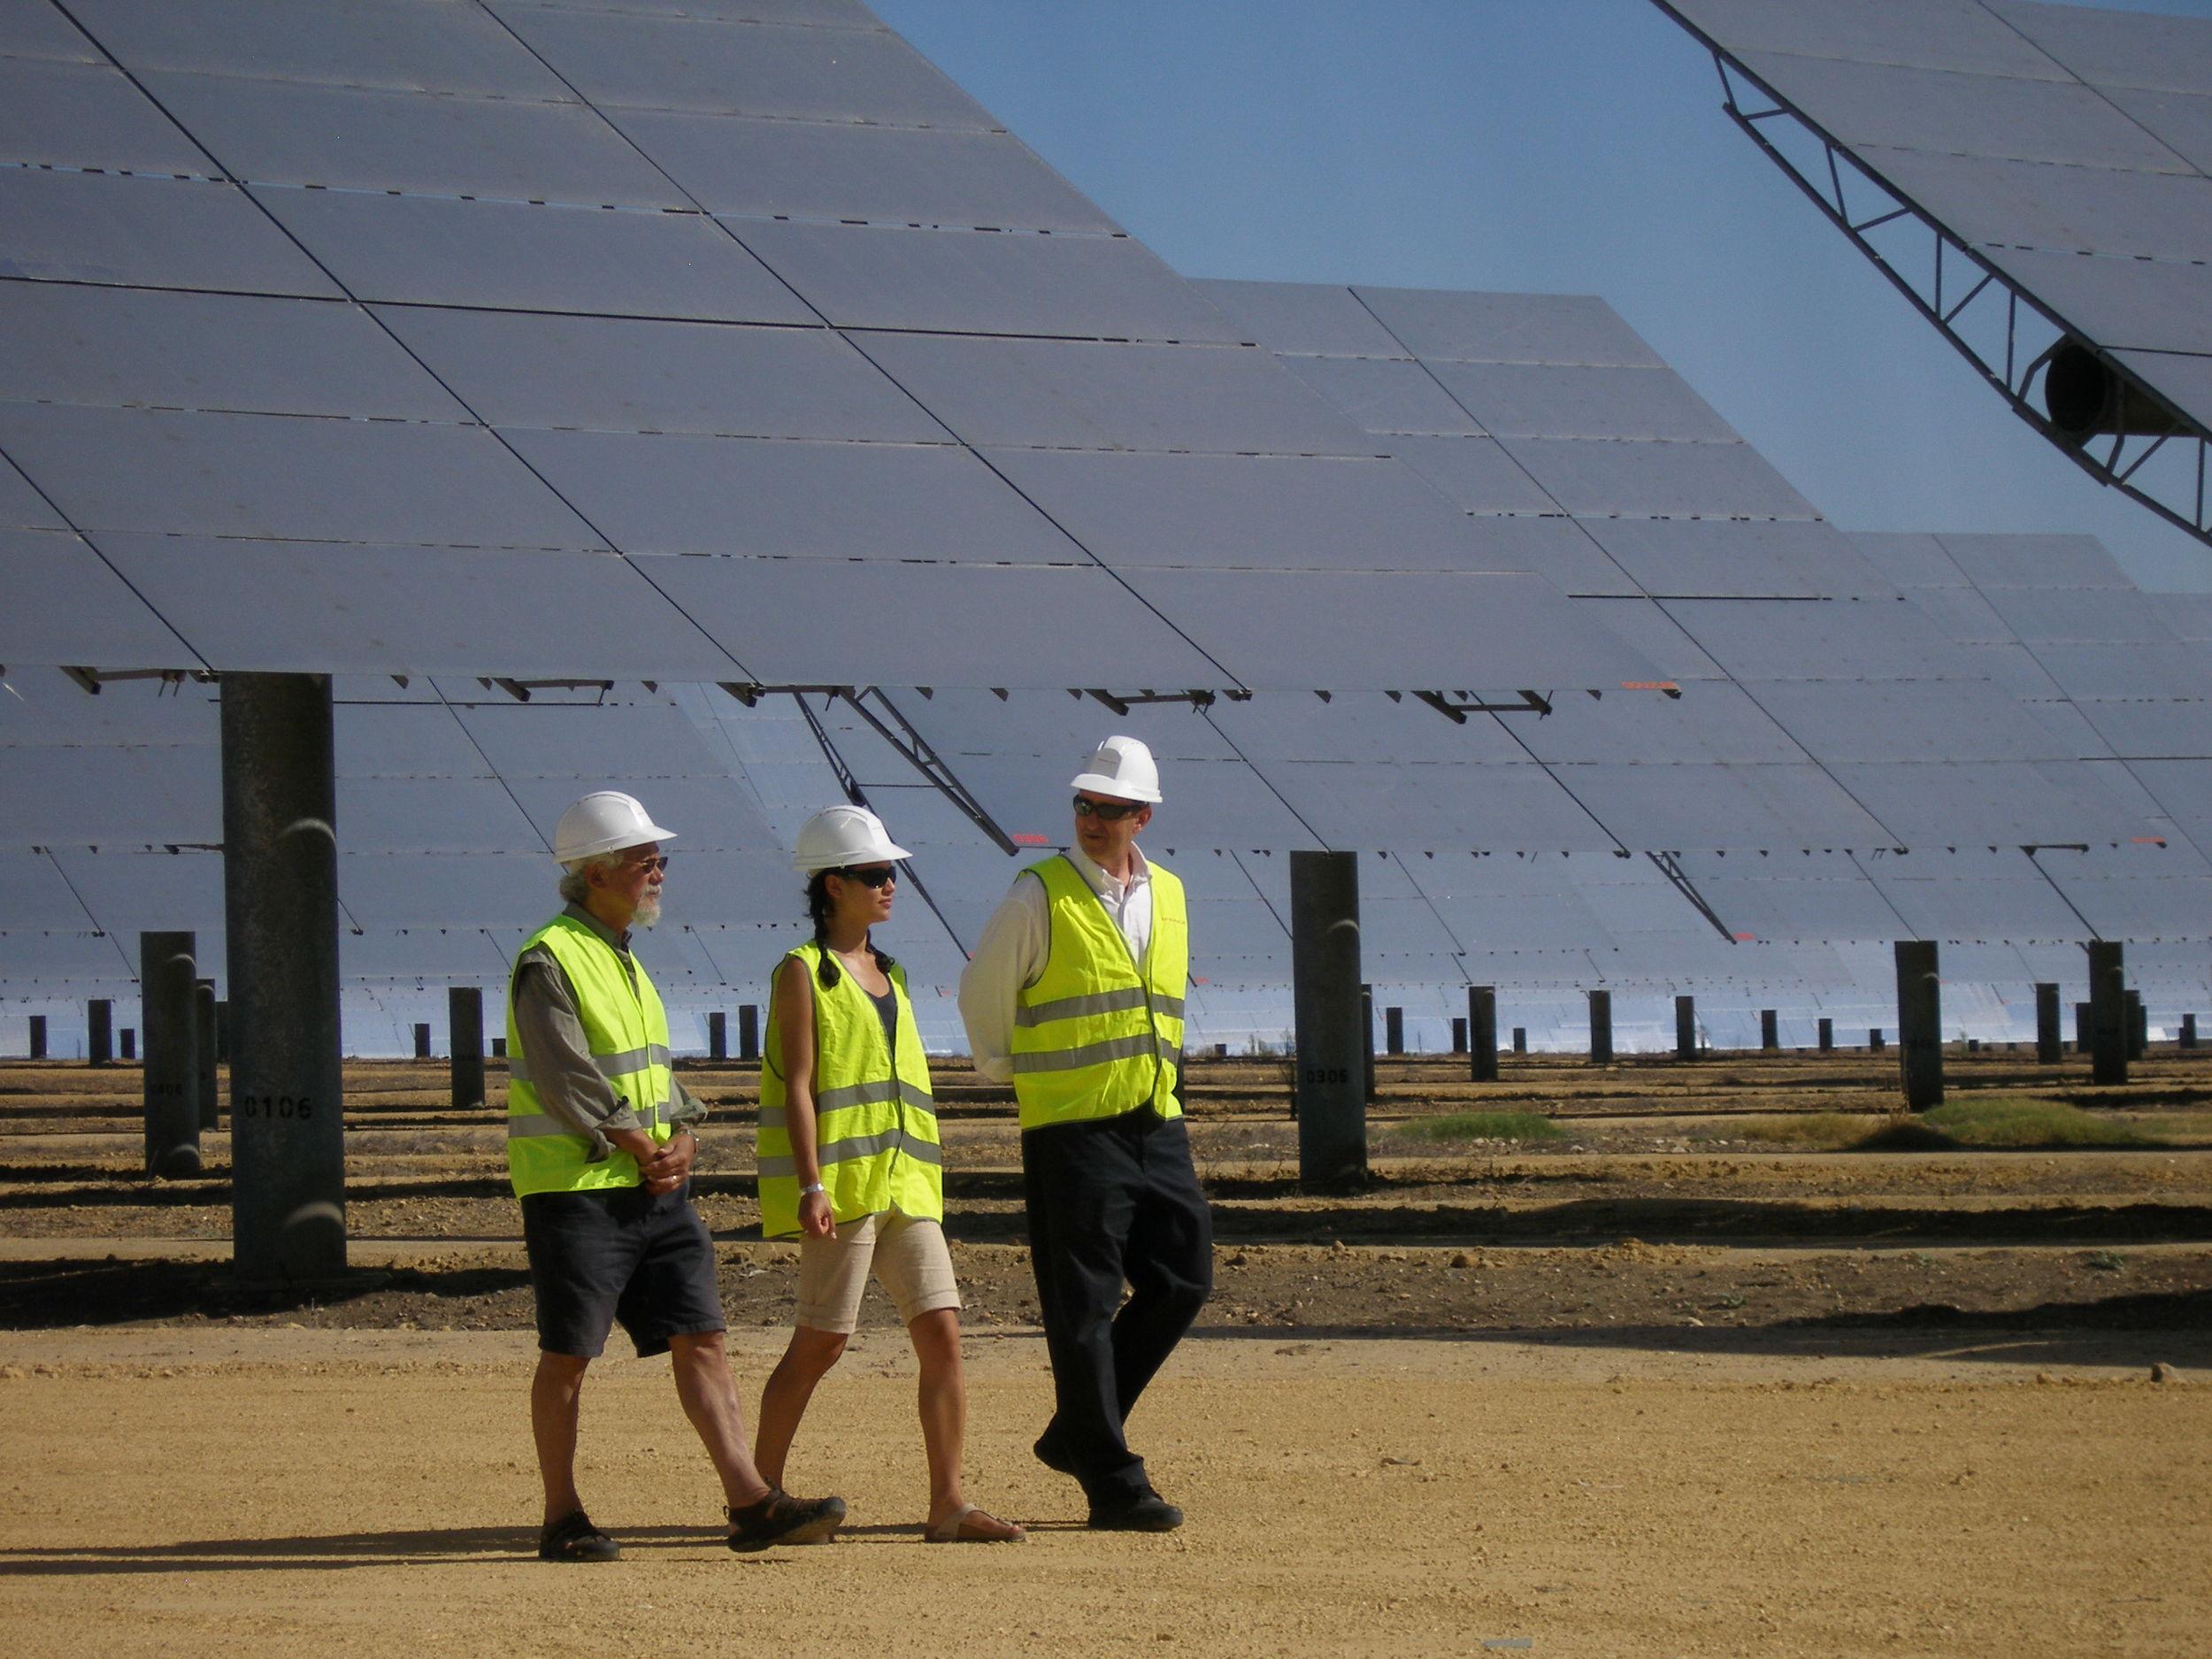 David Suzuki Solar